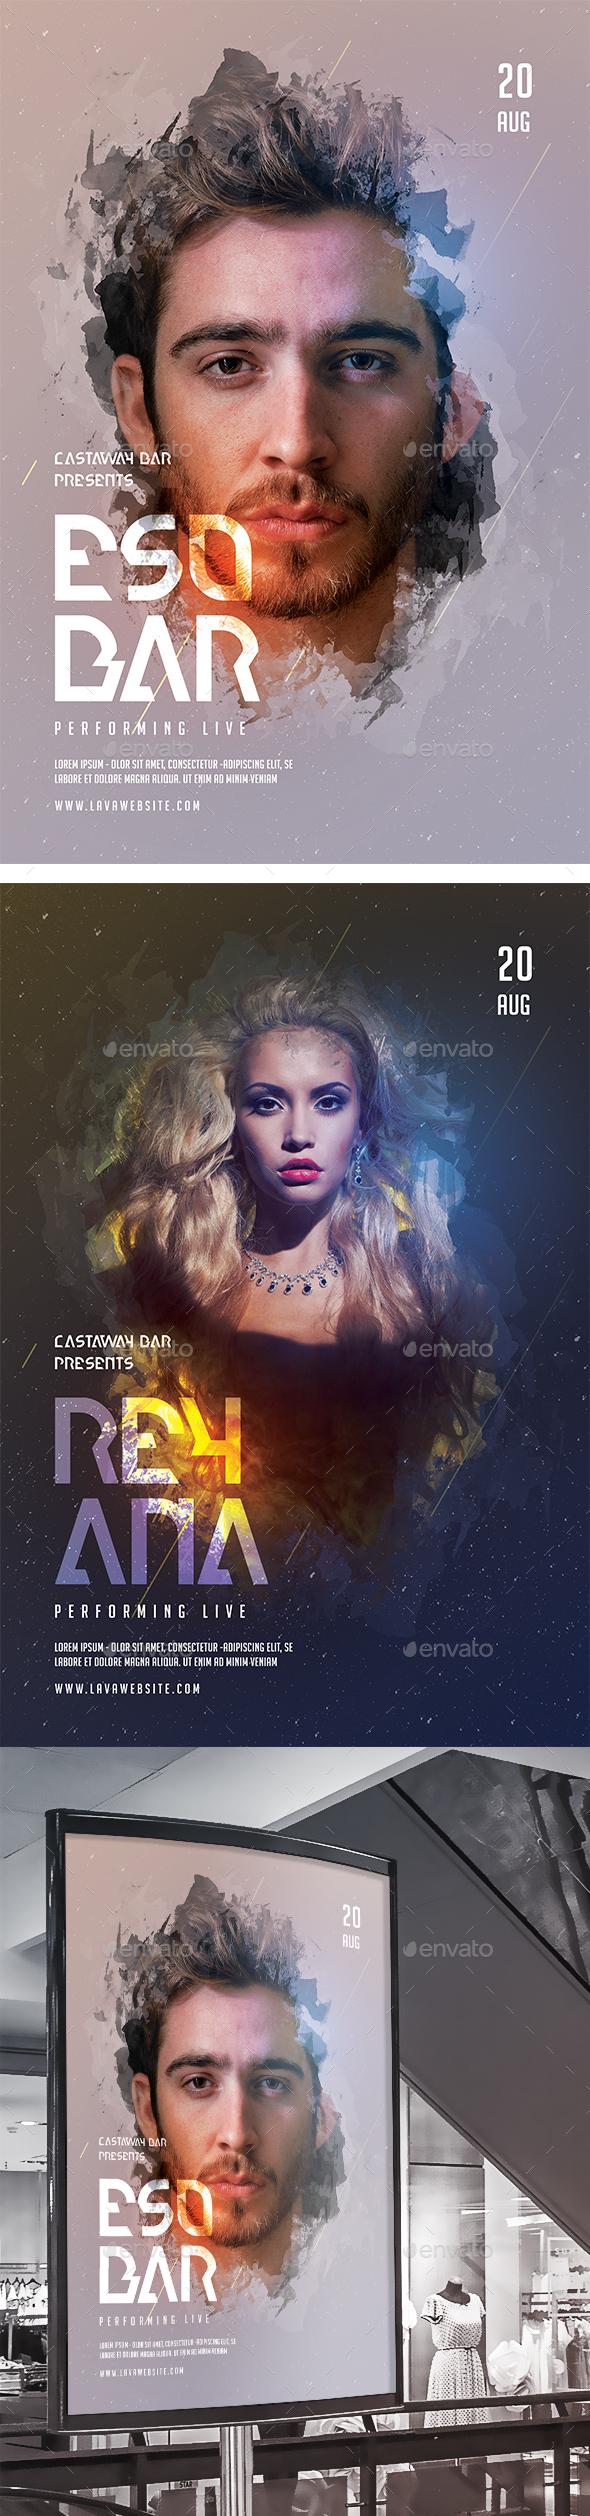 Artist Event Flyer/Poster - Concerts Events